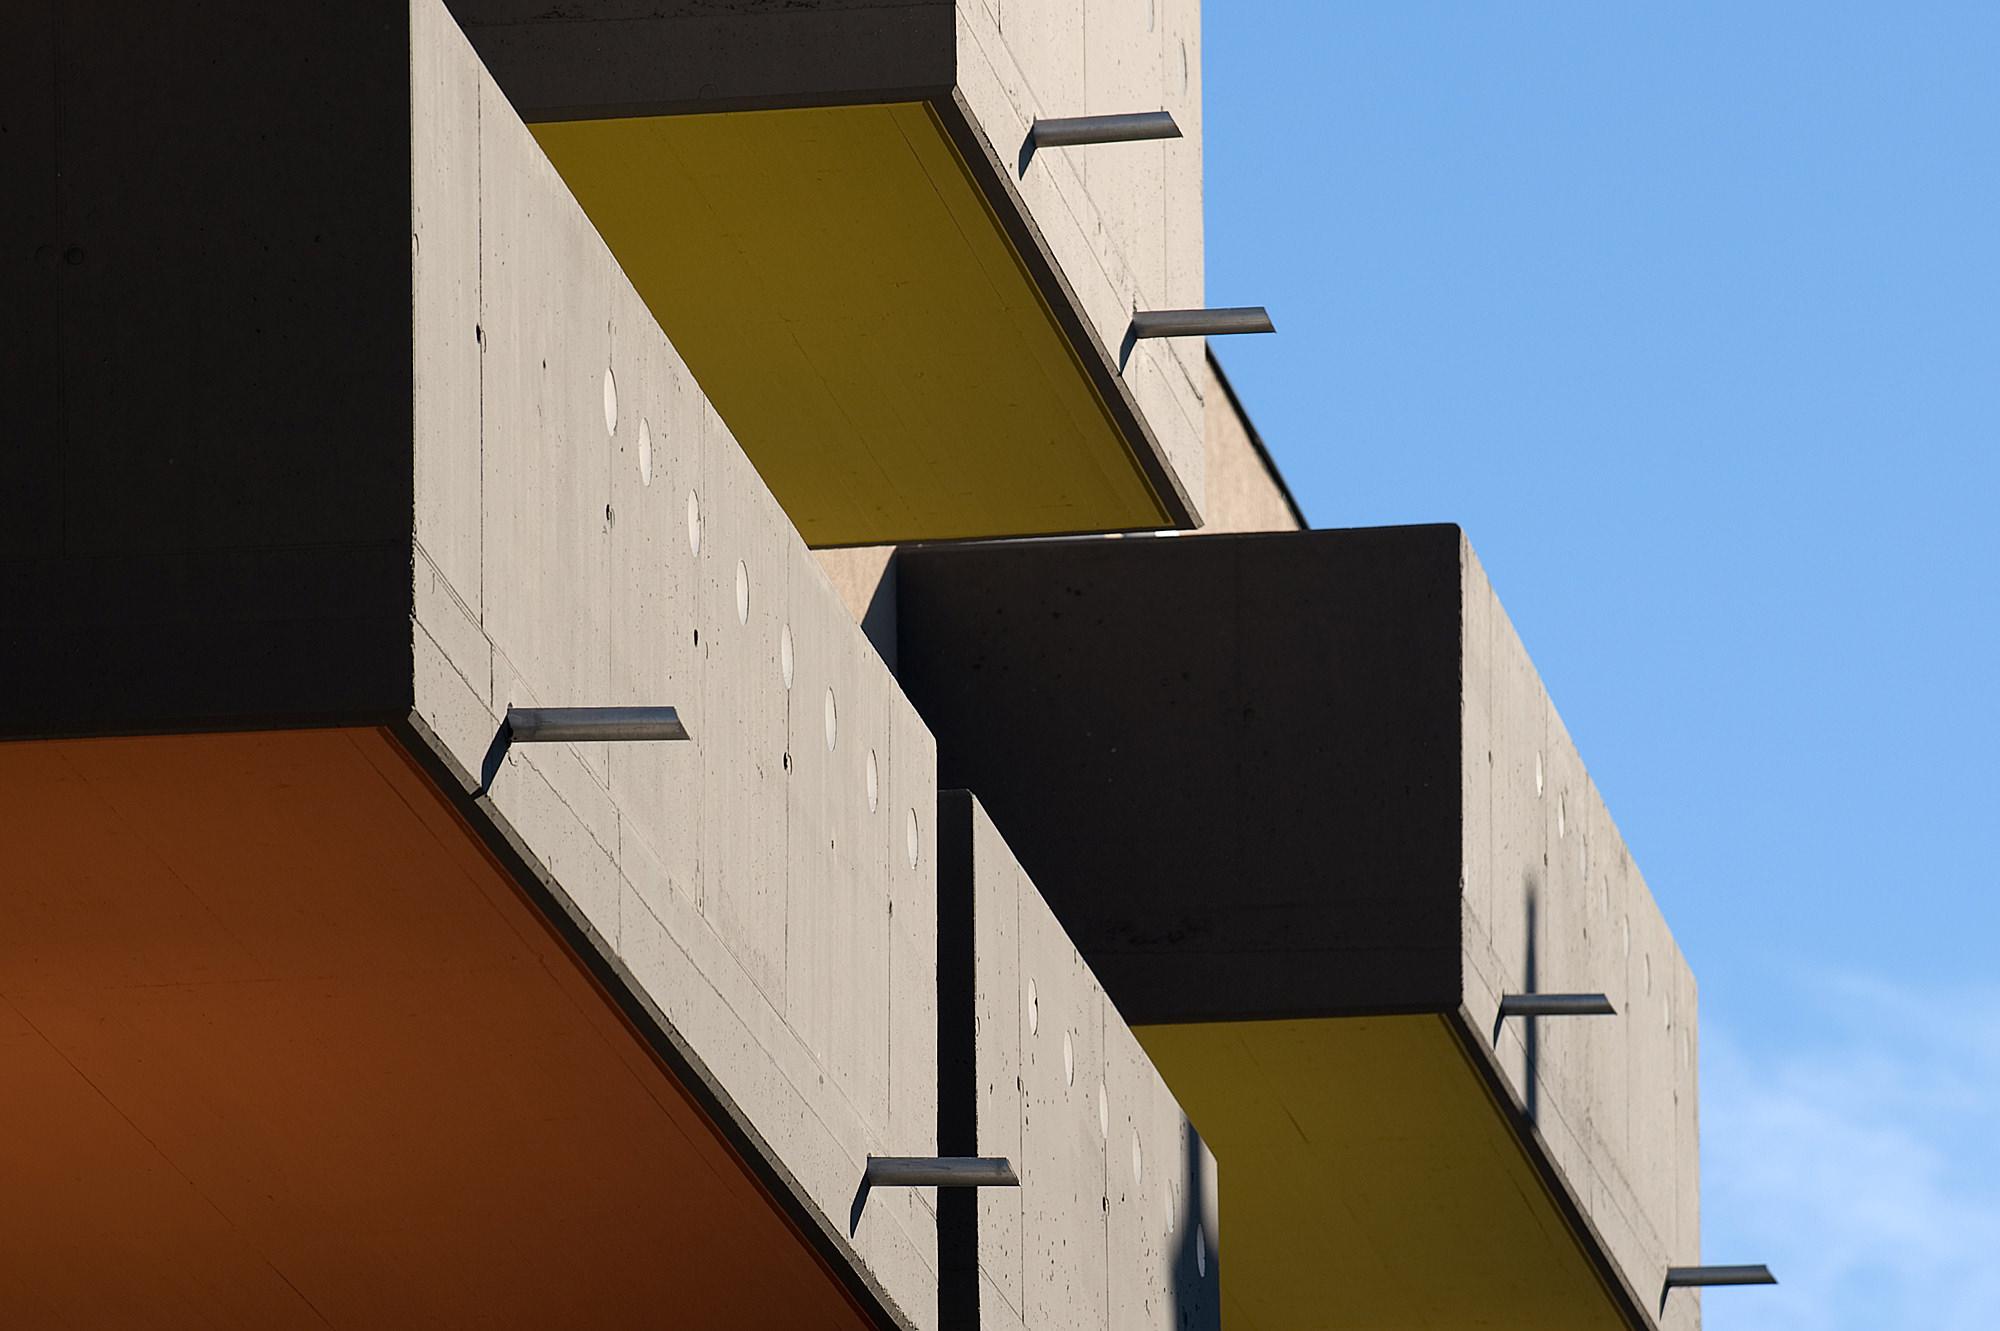 moselgasse 07 wohnbau 1100 wien junger beer architektur